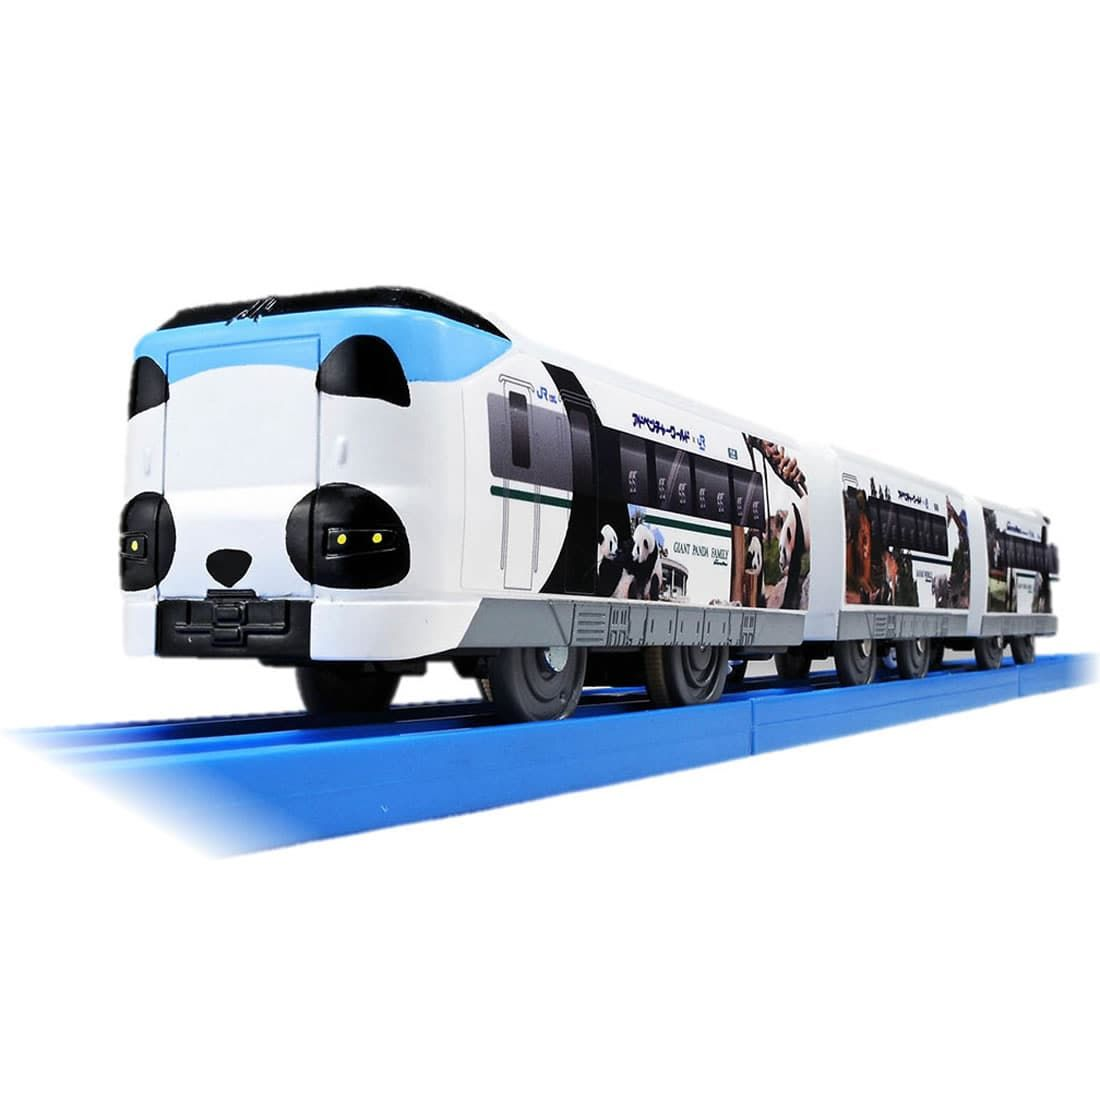 《TAKARA TOMY》交通鐵道 #S-24 287熊貓列車 東喬